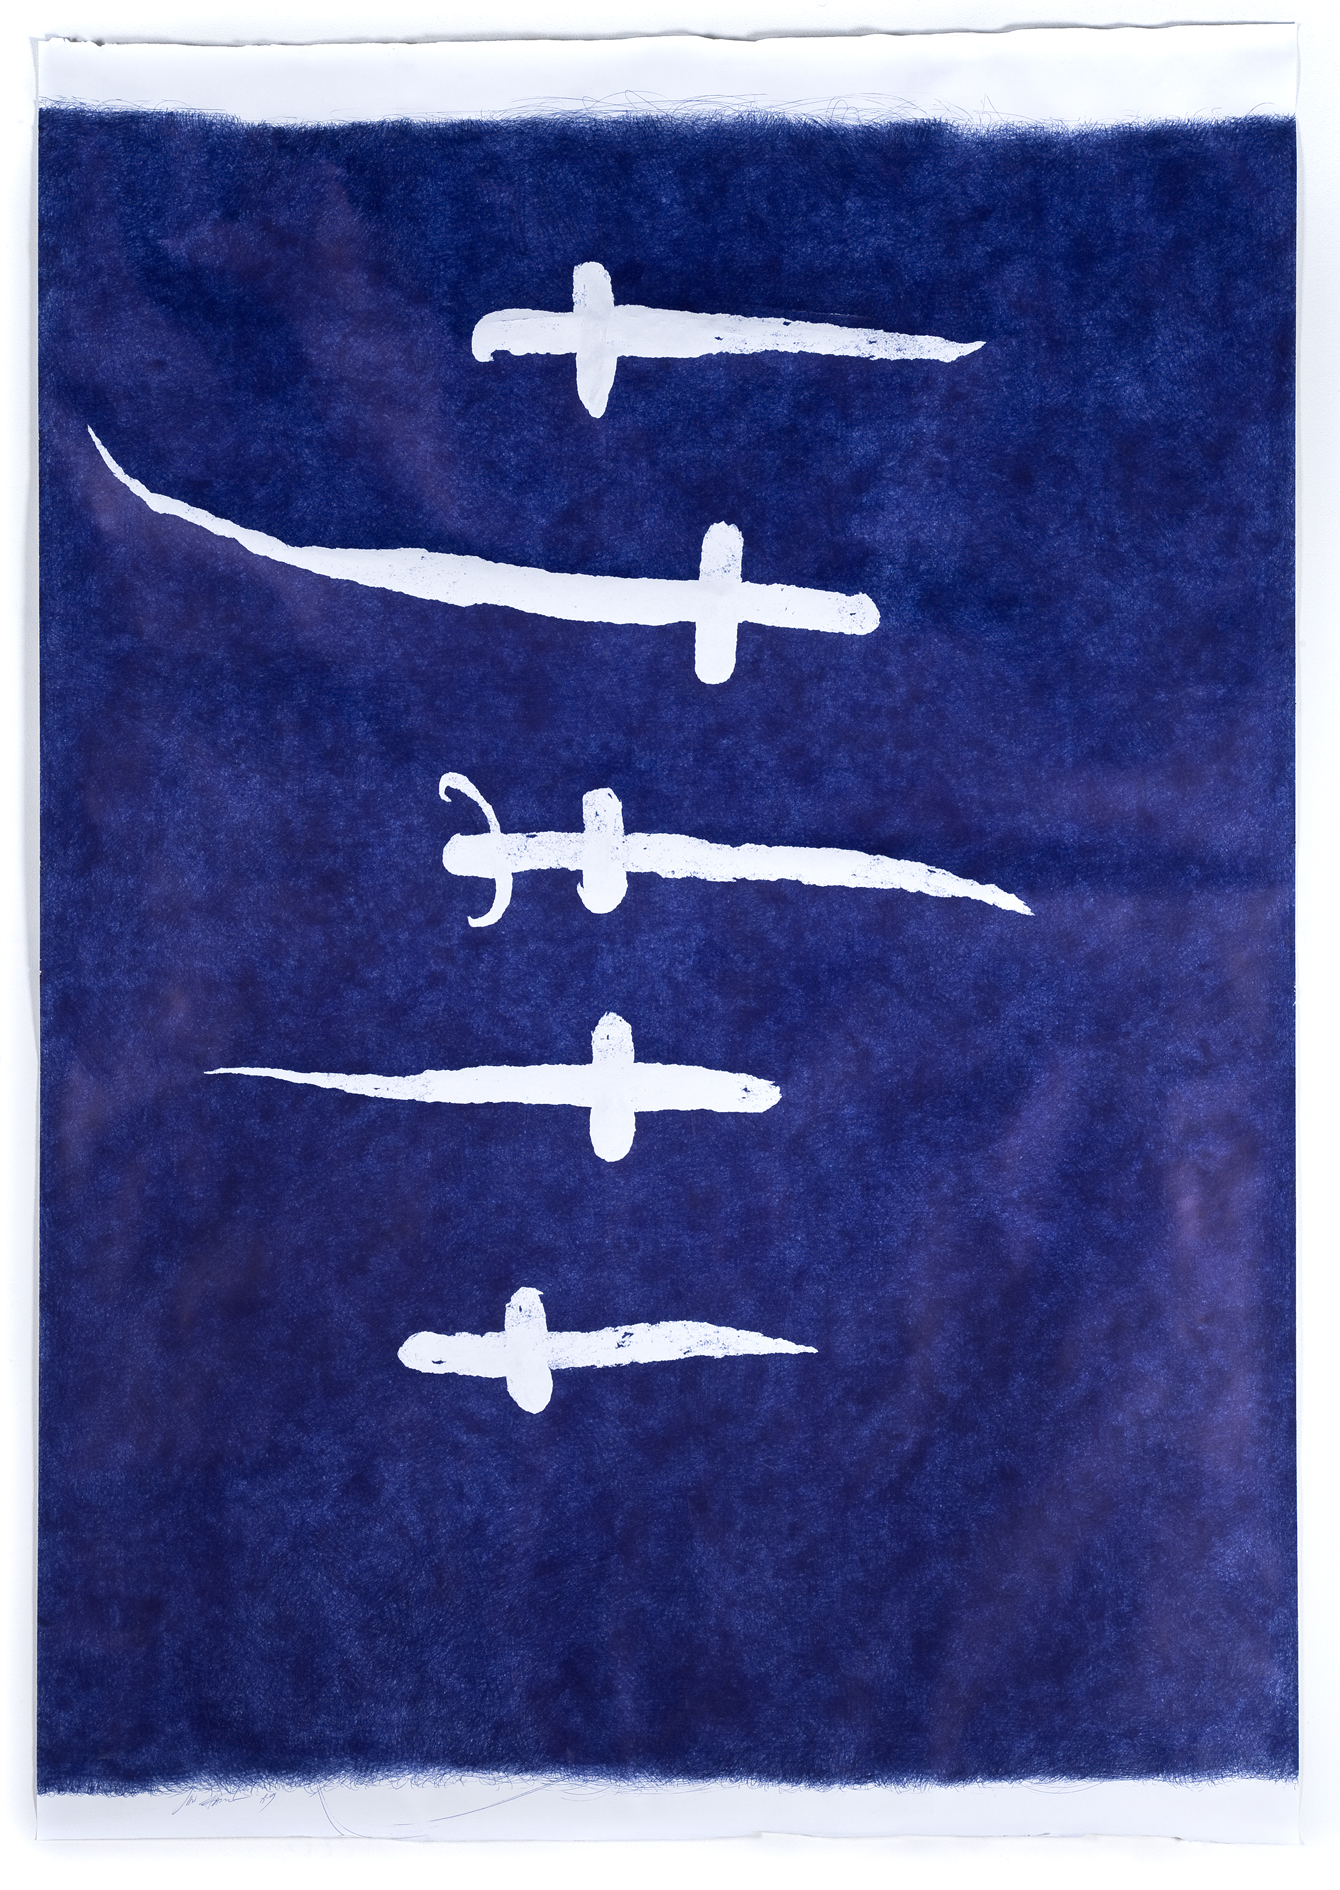 Swords, Crosses and Daggers VII